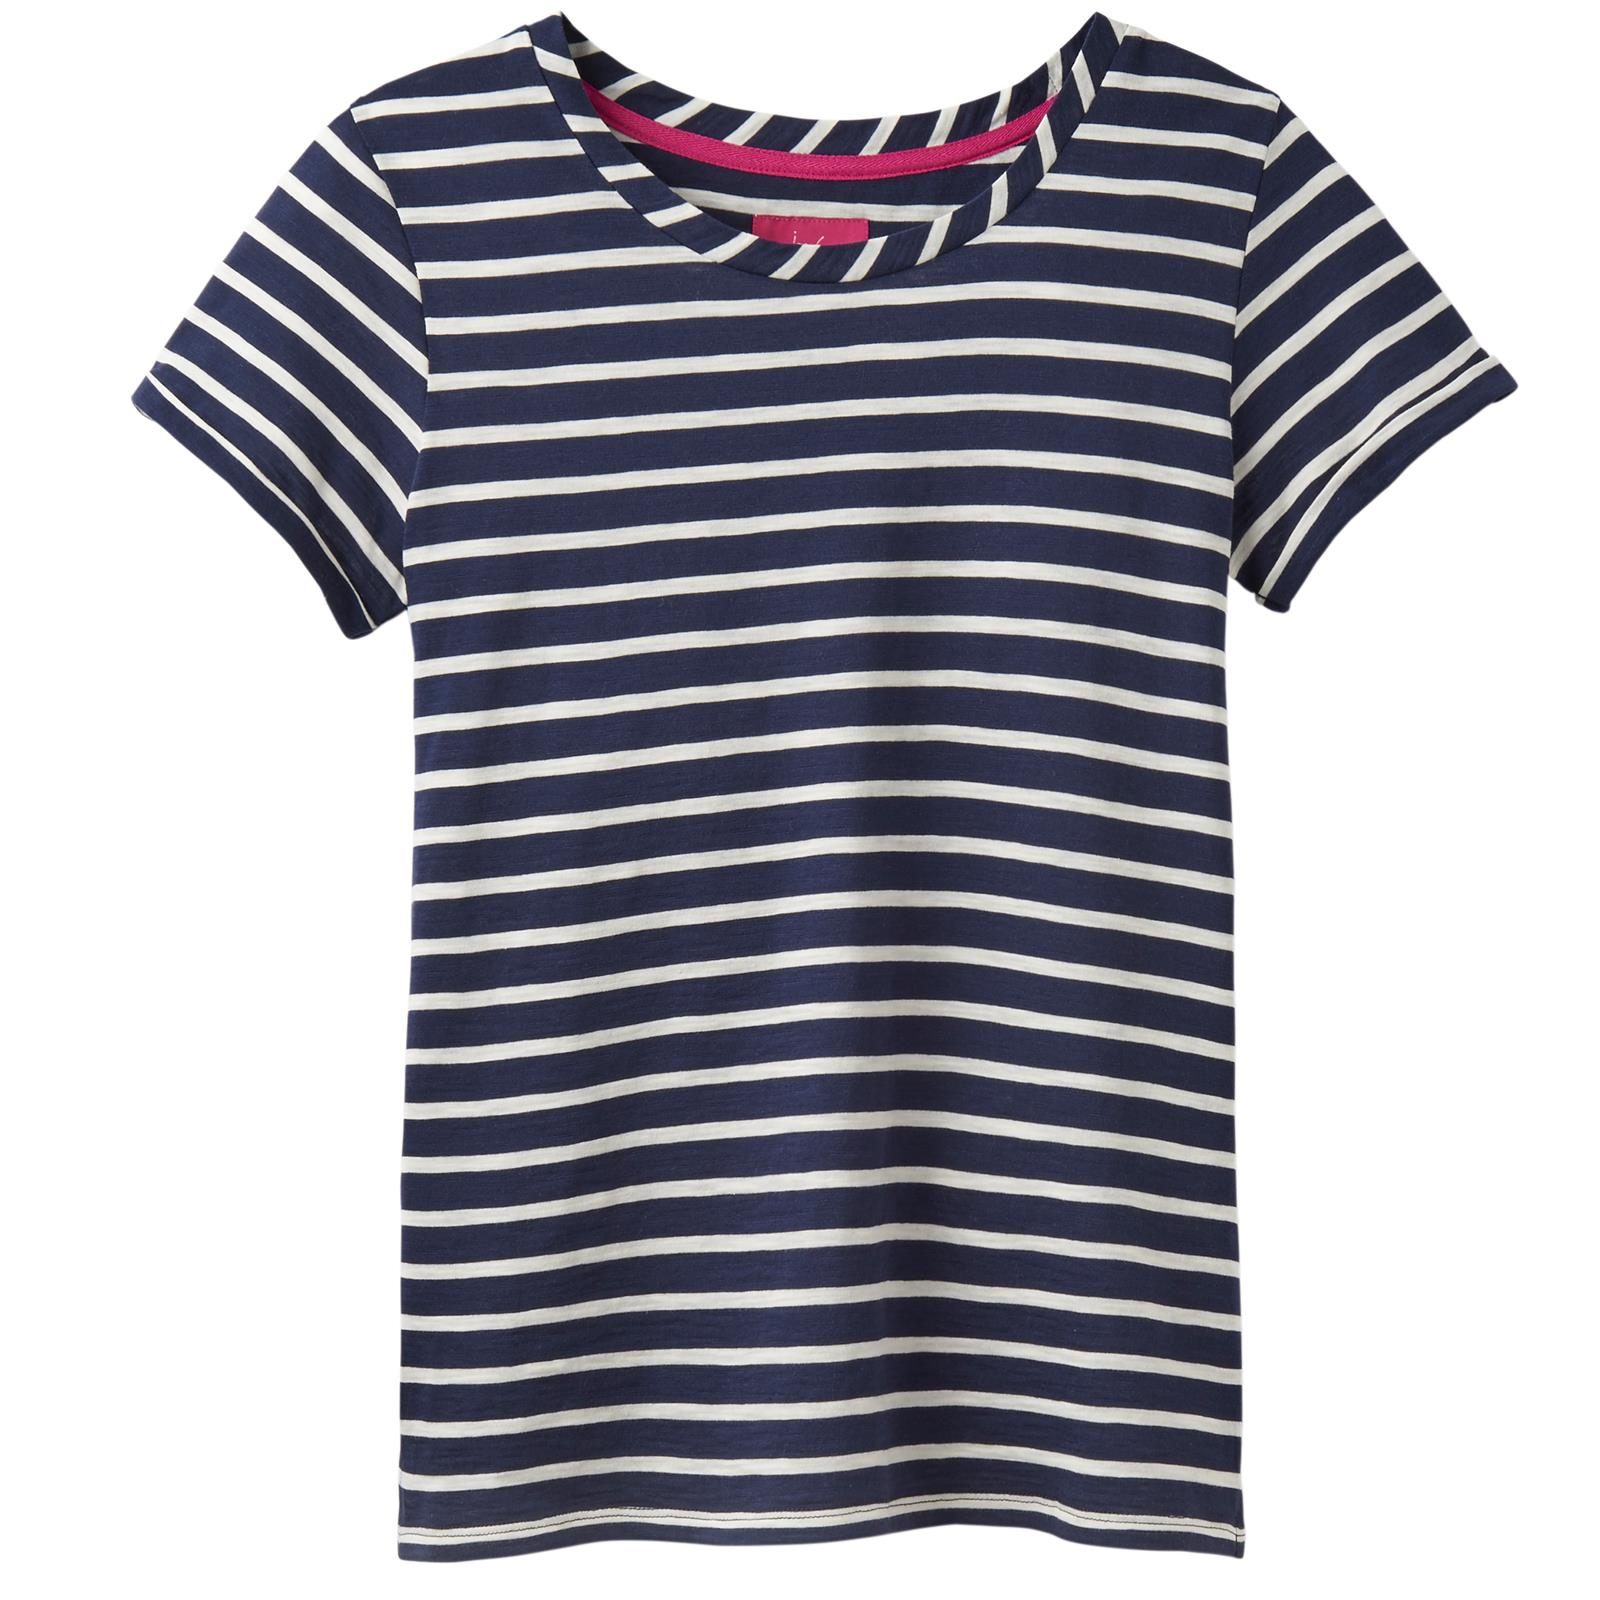 Joules-Nessa-Damas-Equitacion-Manga-corta-Jersey-Top-de-Moda-de-pais-Caminar miniatura 51